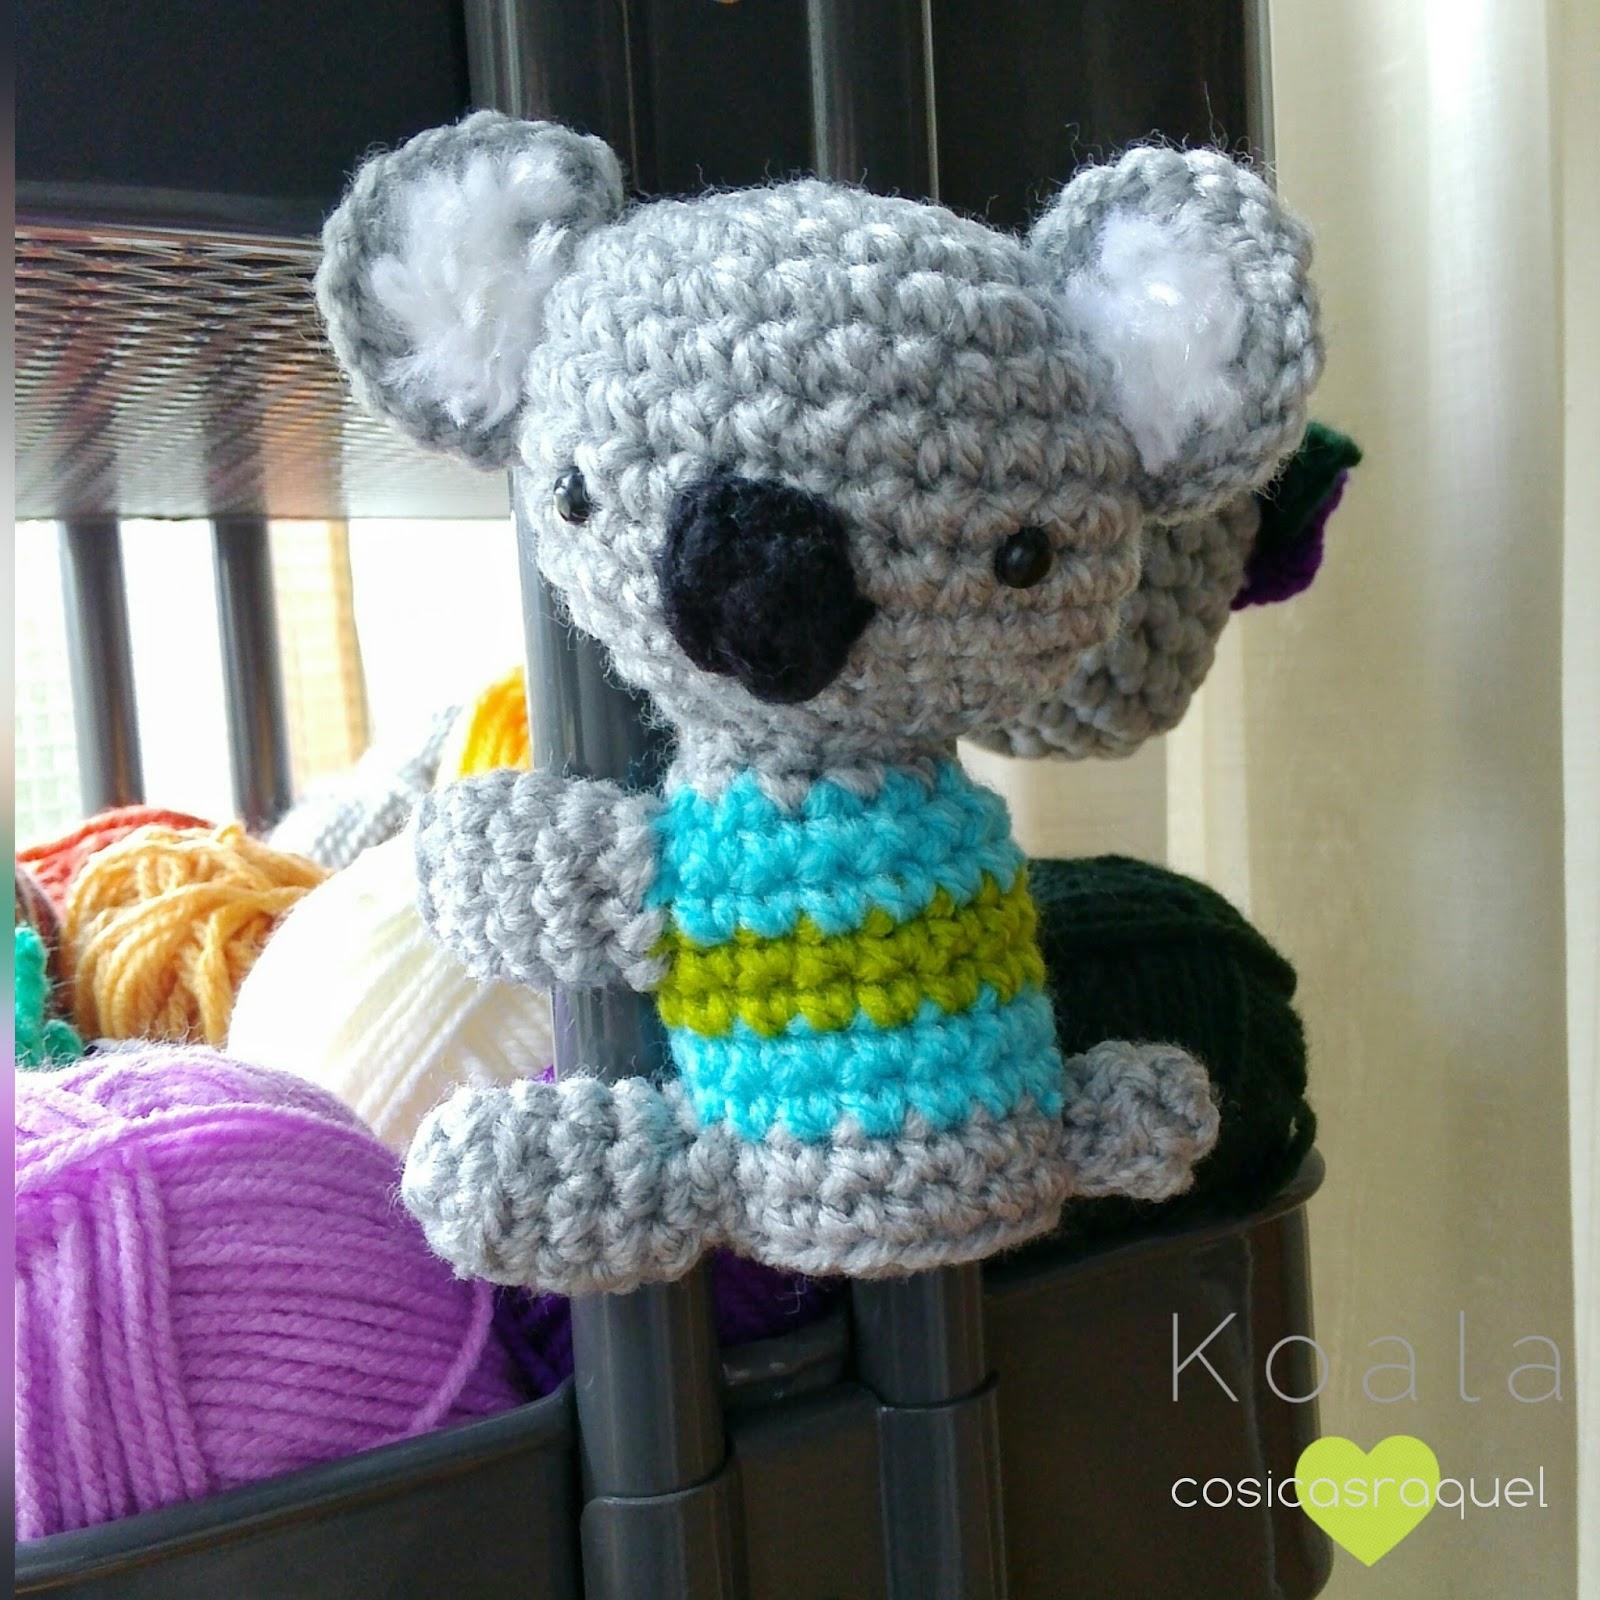 Patron Amigurumi De Koala : cosicasraquel: Koala Amigurumi